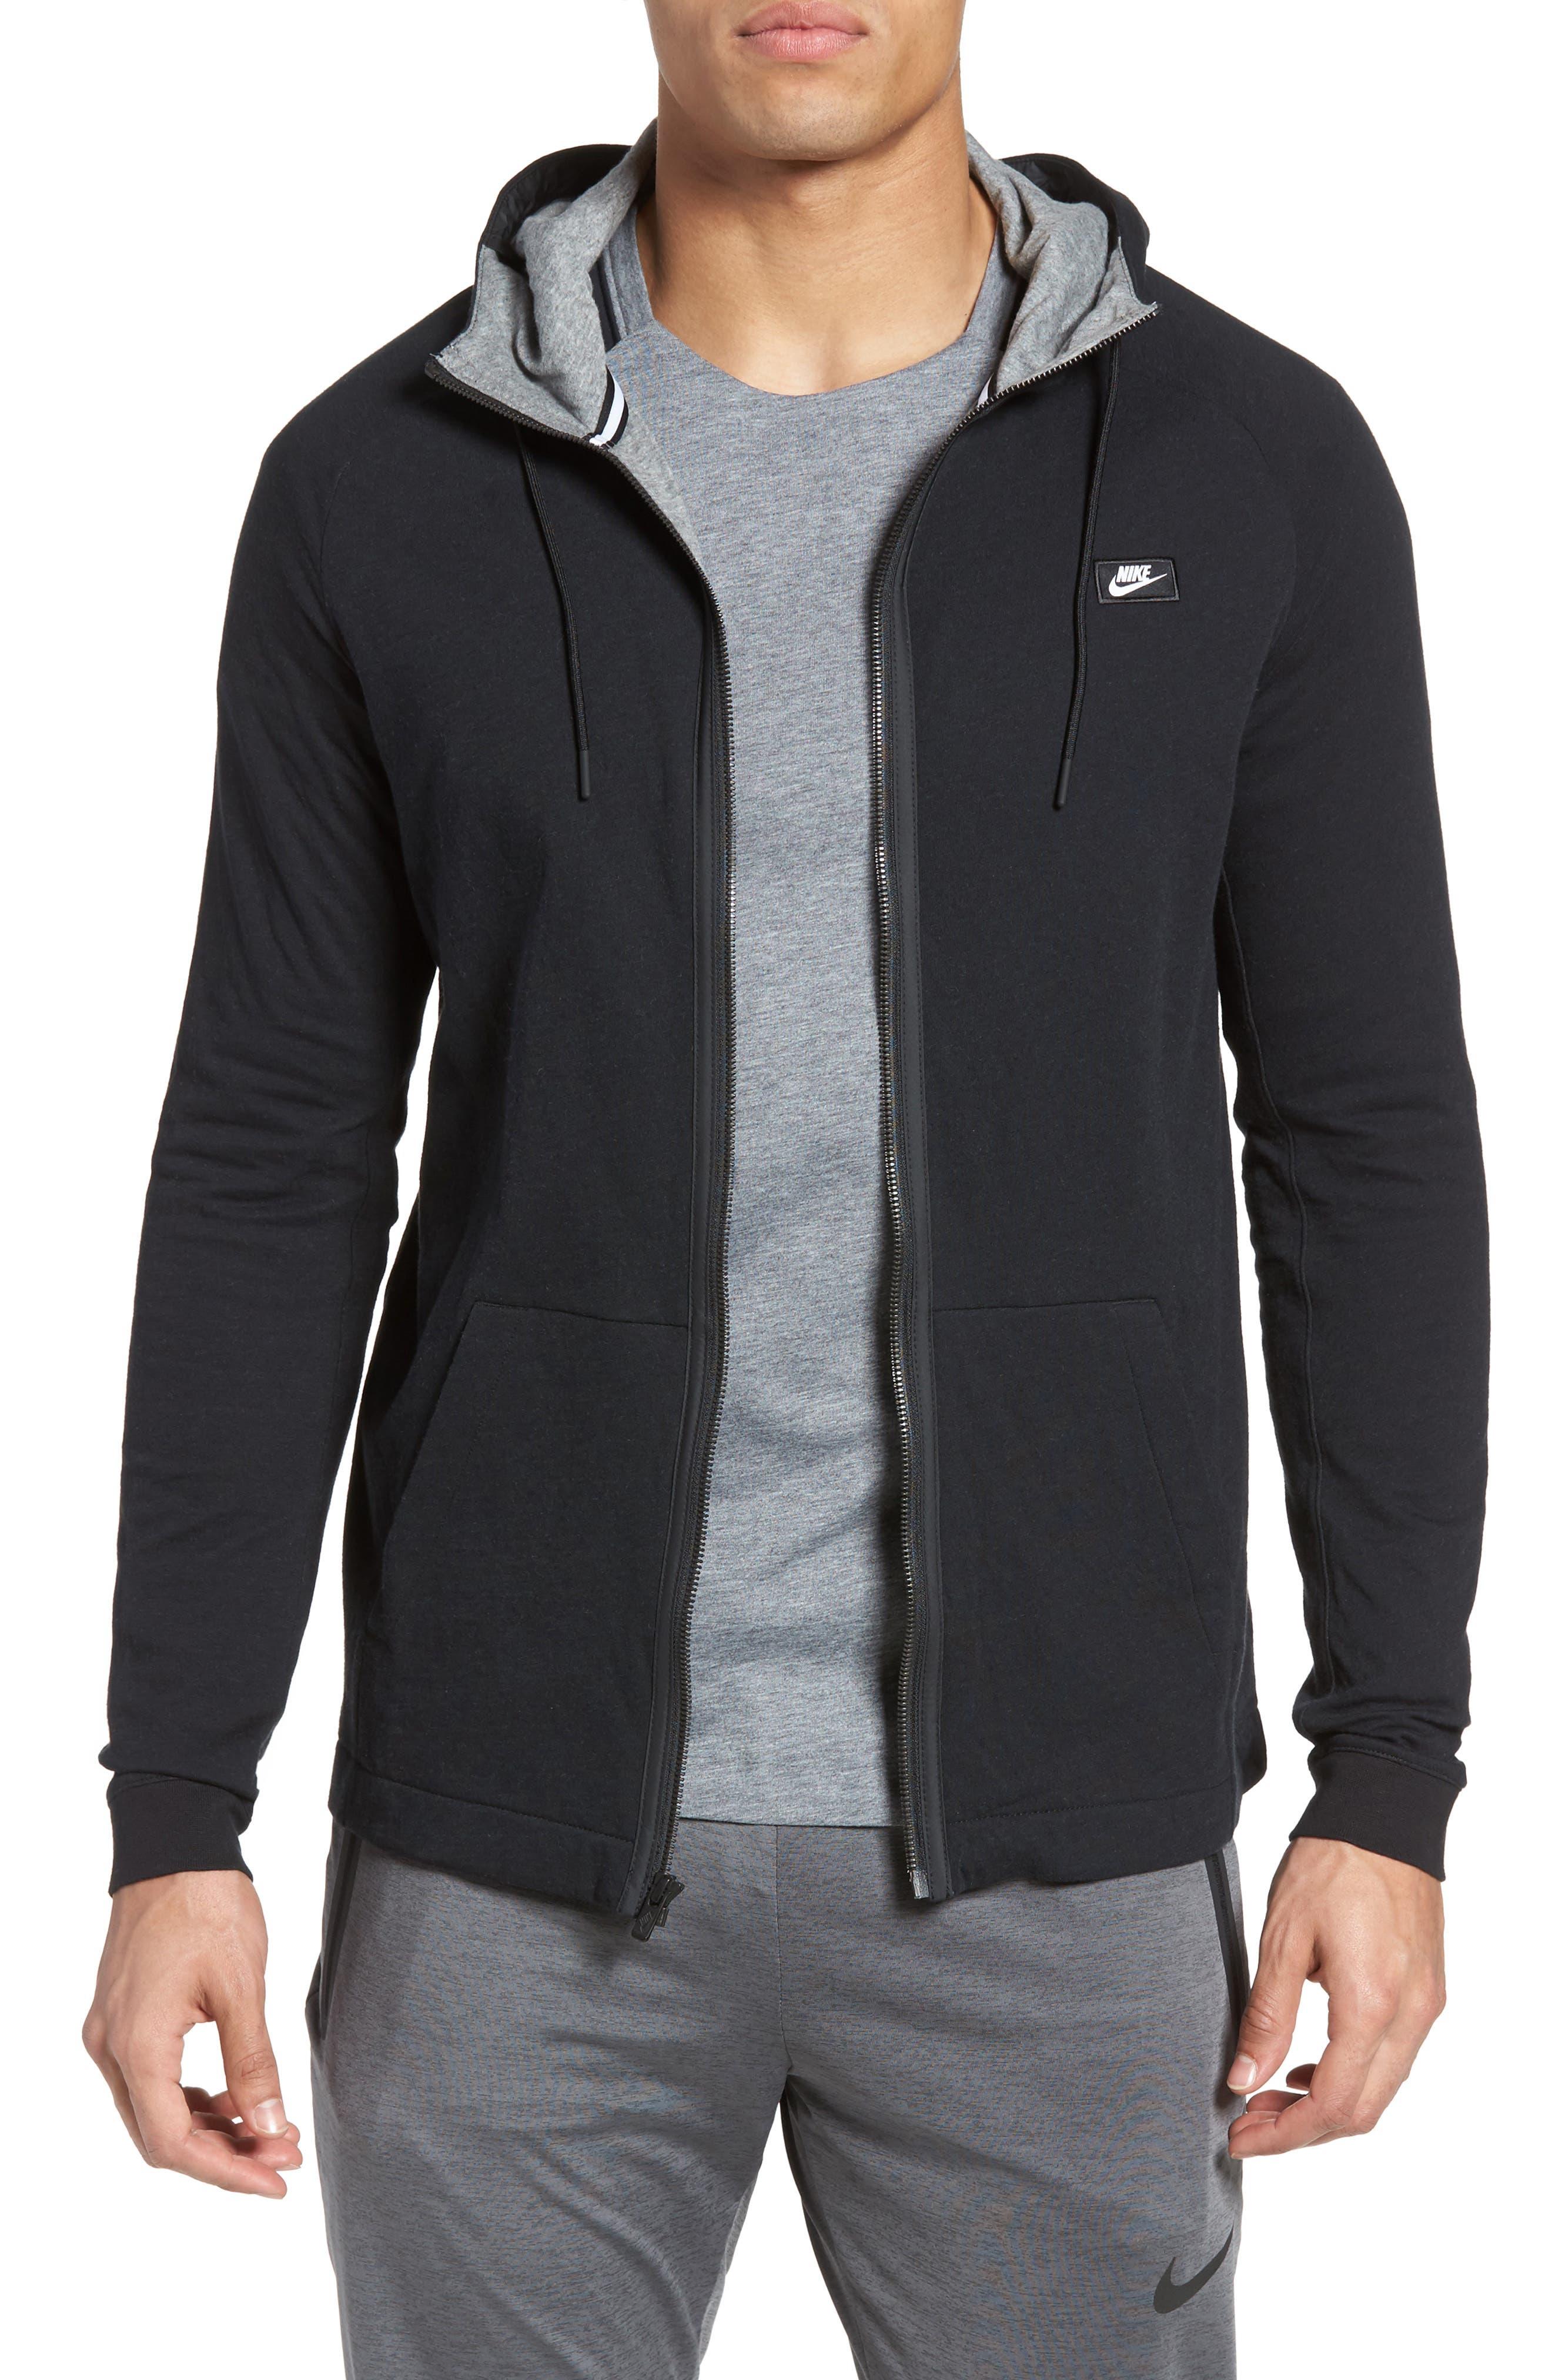 NIKE, Tech Regular Fit Fleece Hoodie, Main thumbnail 1, color, BLACK/ CARBON HEATHER